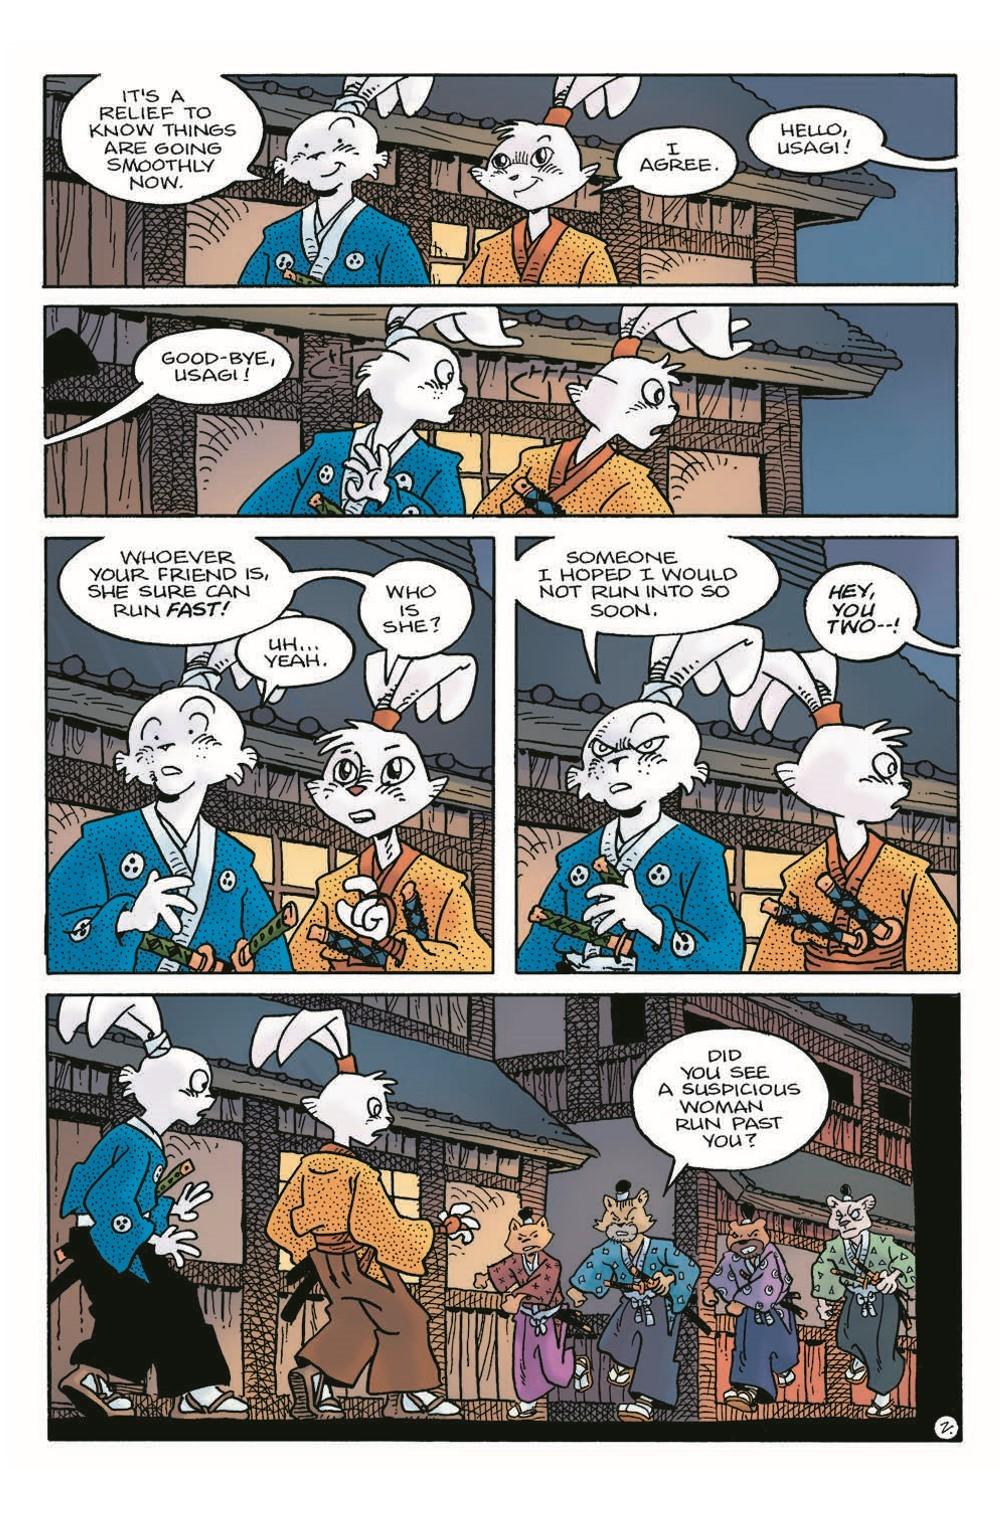 Usagi22_pr-4 ComicList Previews: USAGI YOJIMBO #22